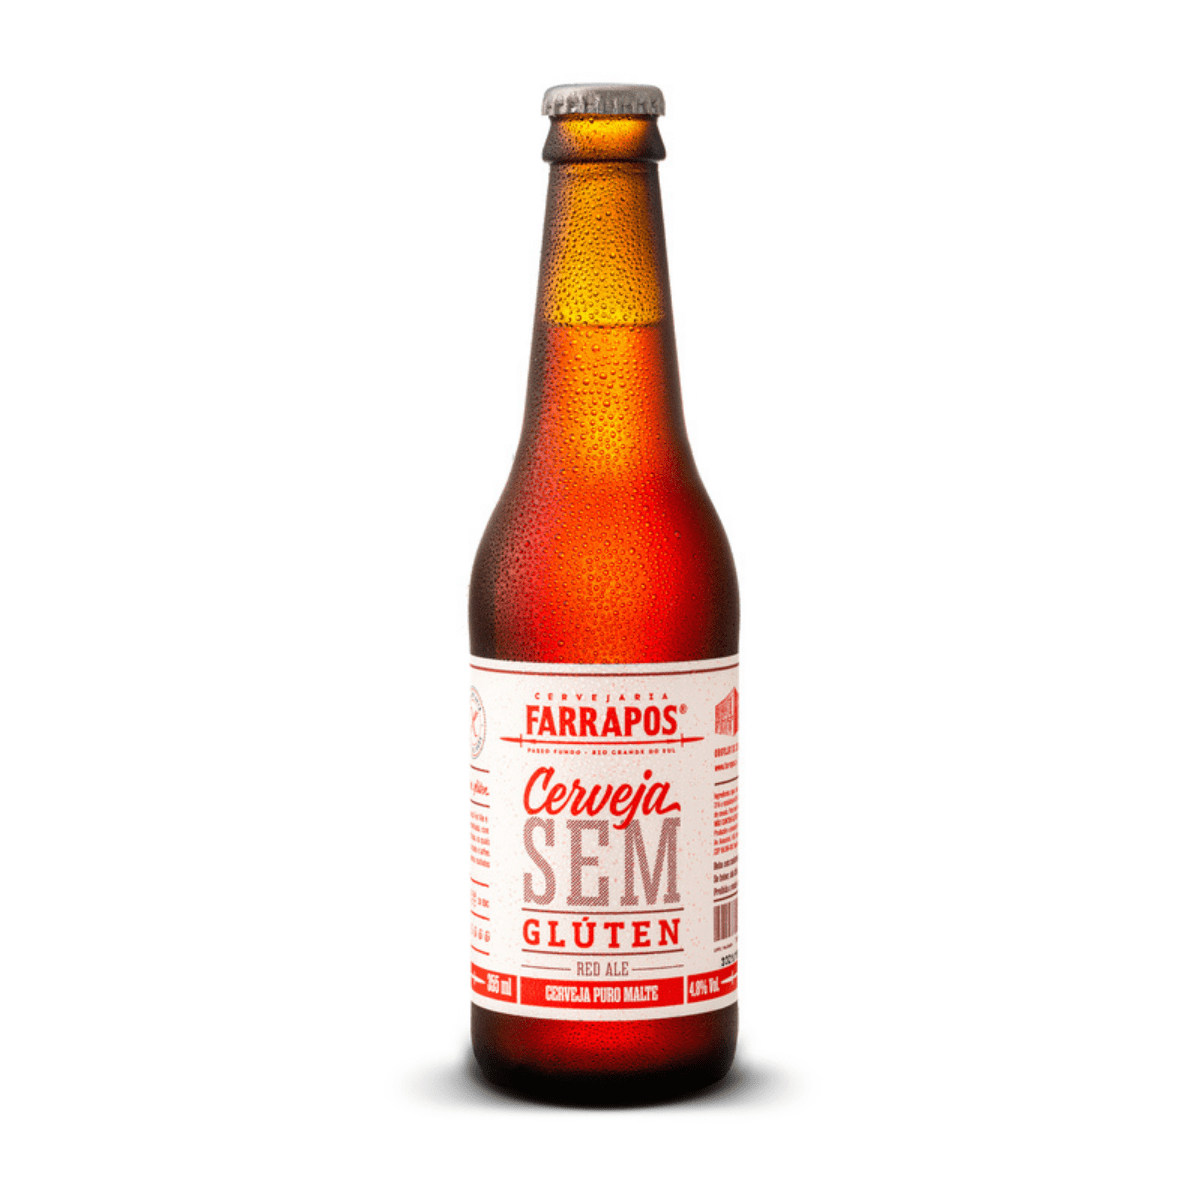 Cerveja Farrapos Sem Gluten Red Ale 355 ml